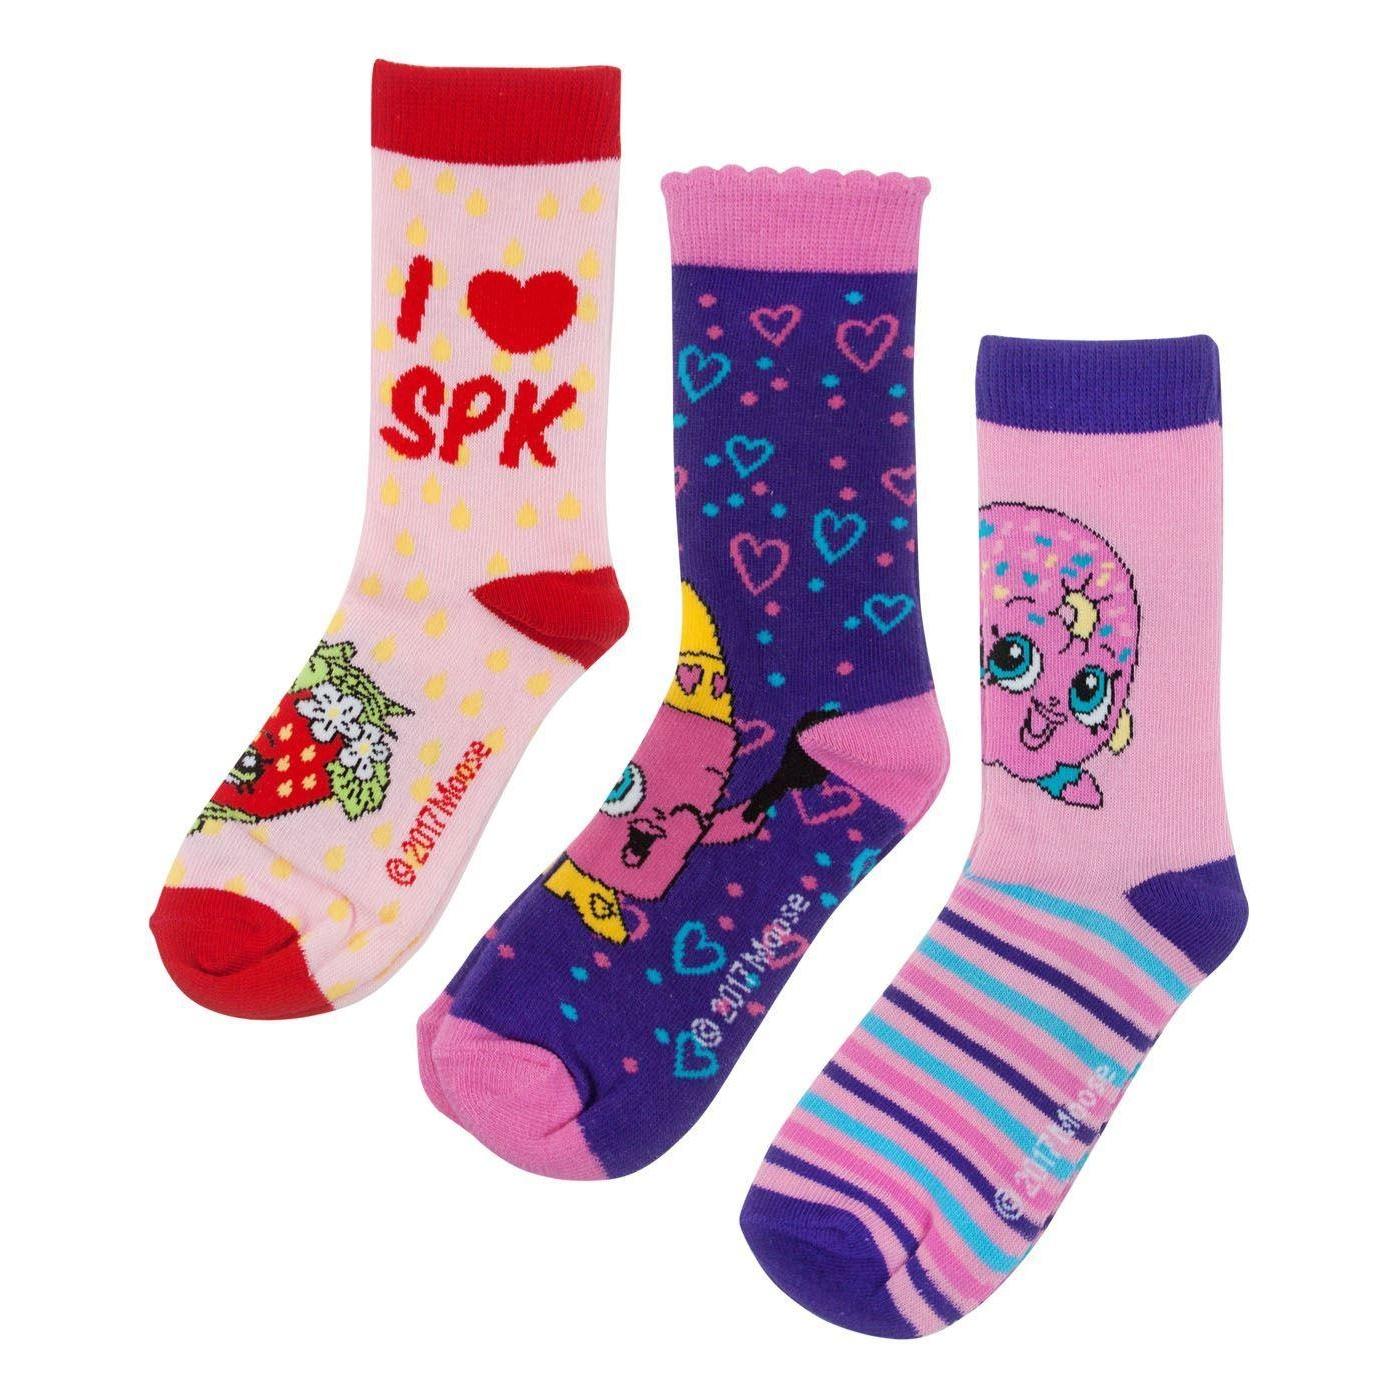 Shopkins-Childrens-Girls-Assorted-Character-Socks-Set-3-Pairs-NS4882